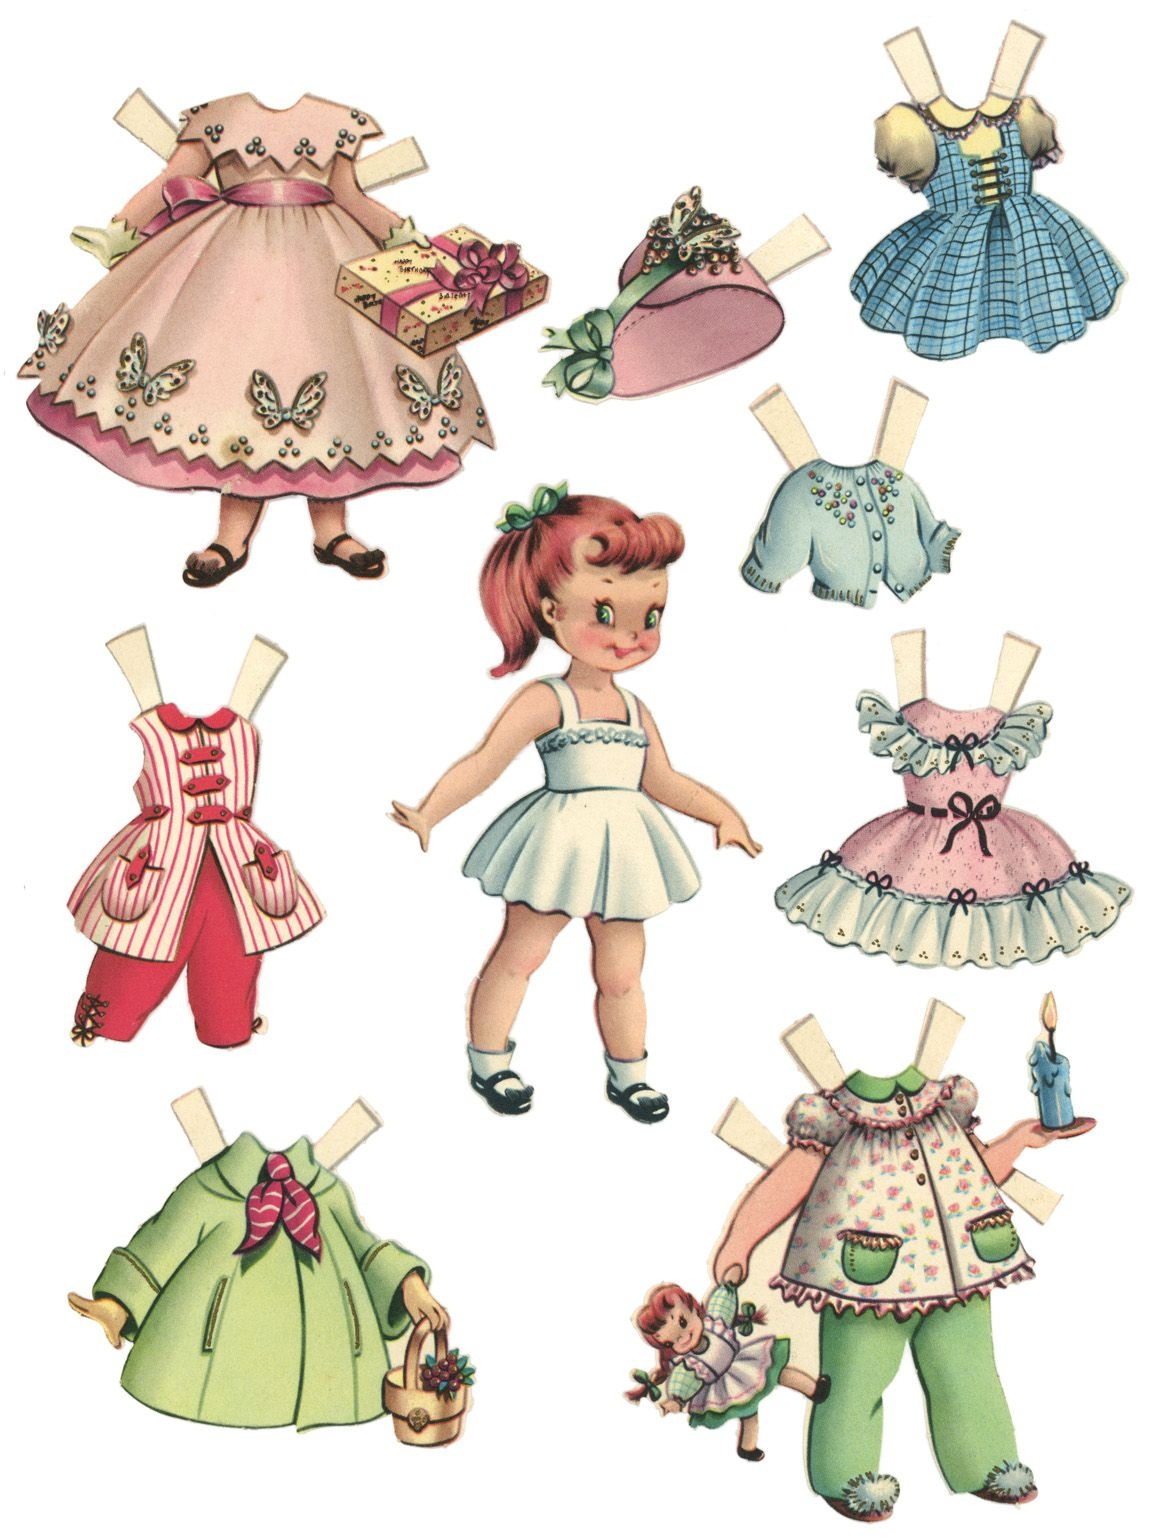 10 Free Printable Paper Dolls Sets !! | Grandparent World | Paper - Free Printable Paper Dolls From Around The World